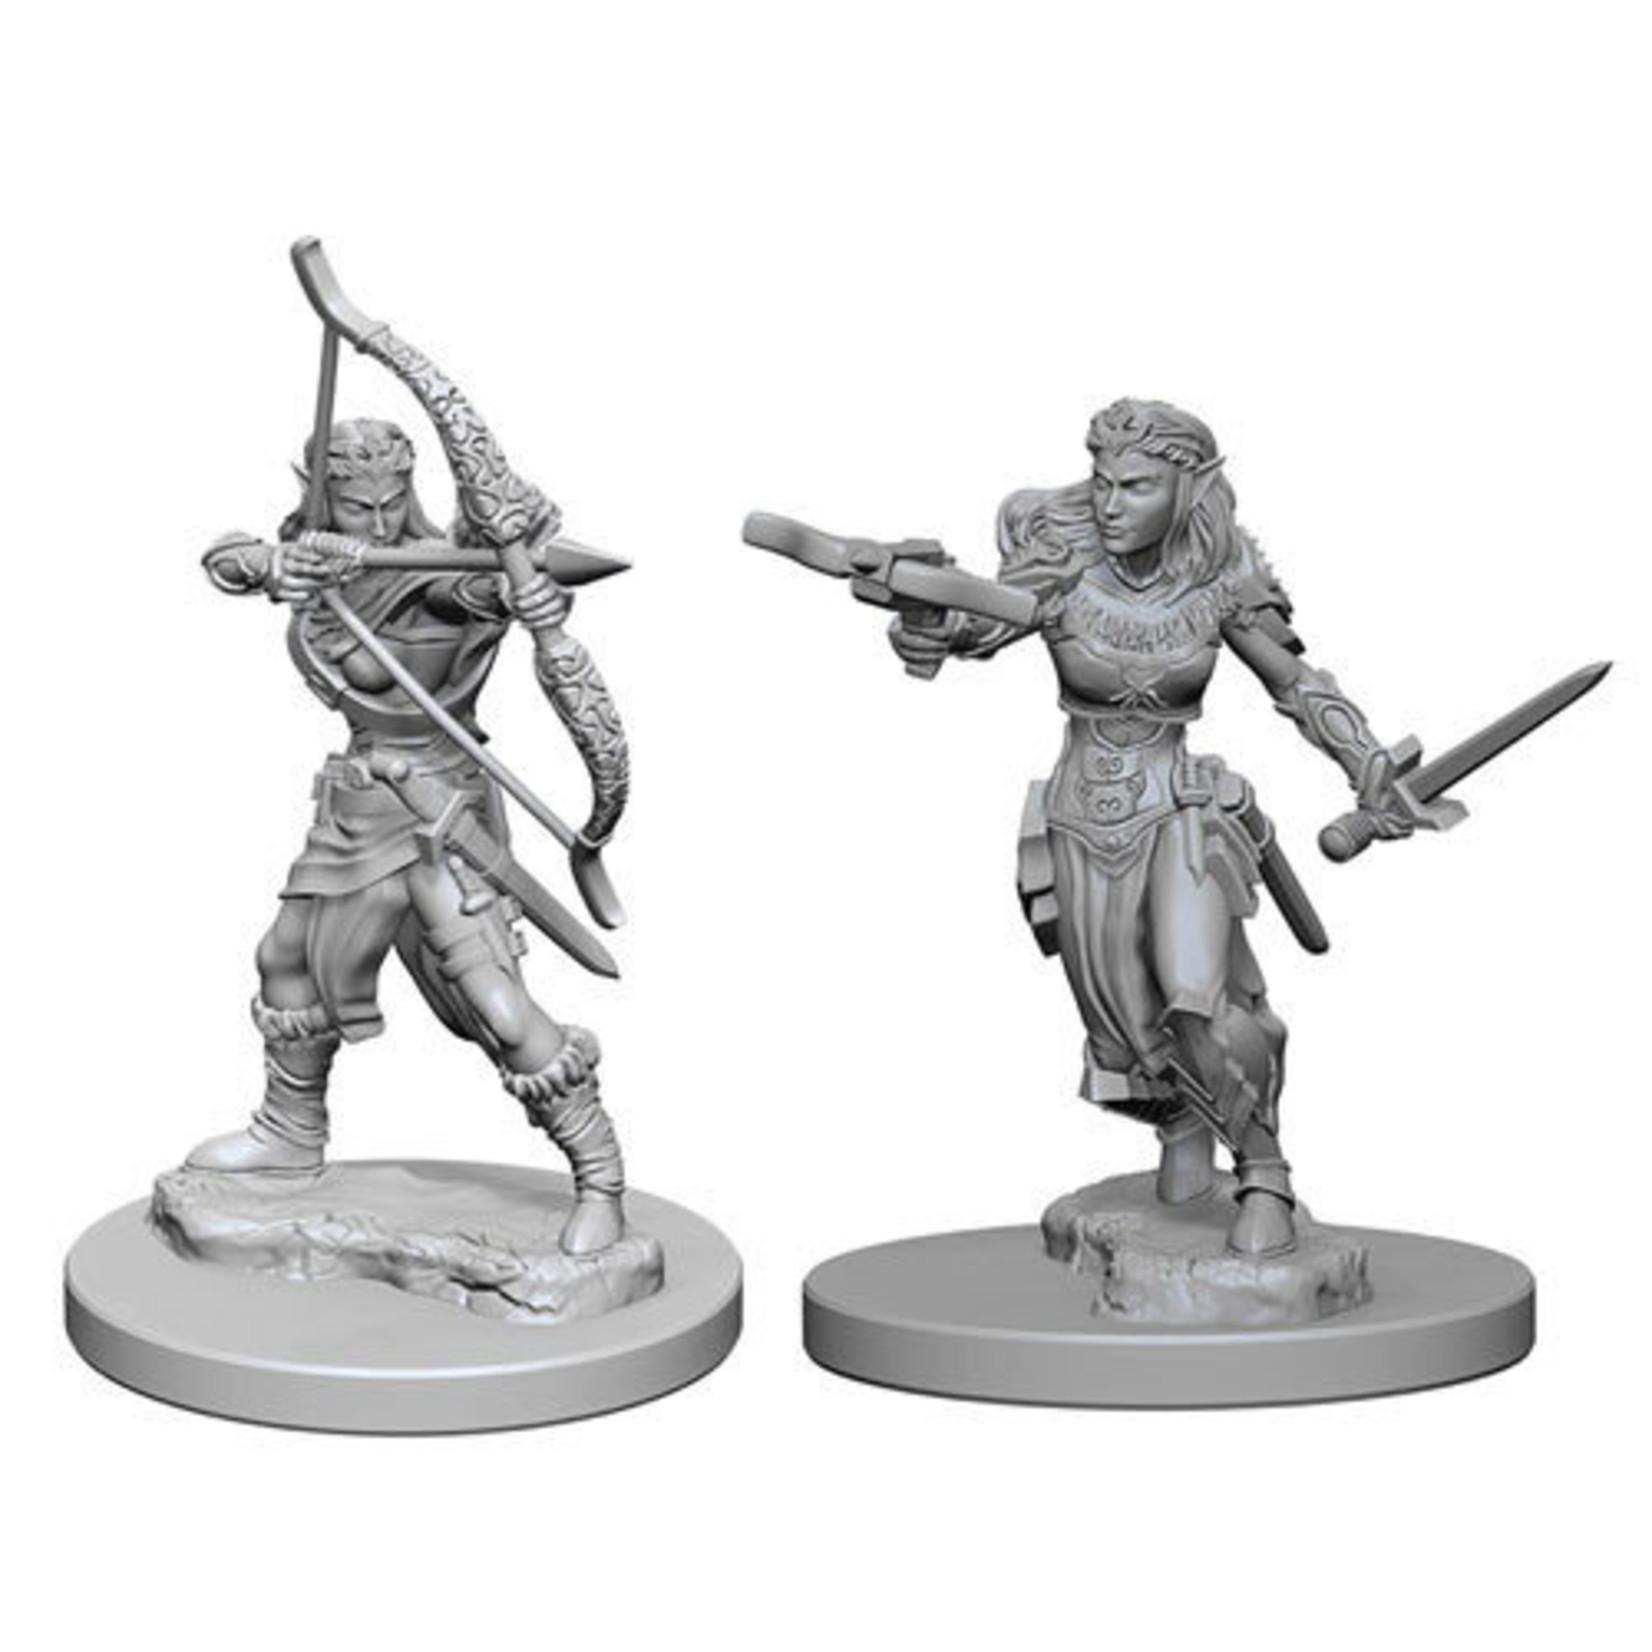 WizKids/Neca 72638 Nolzur's Elf Female Ranger